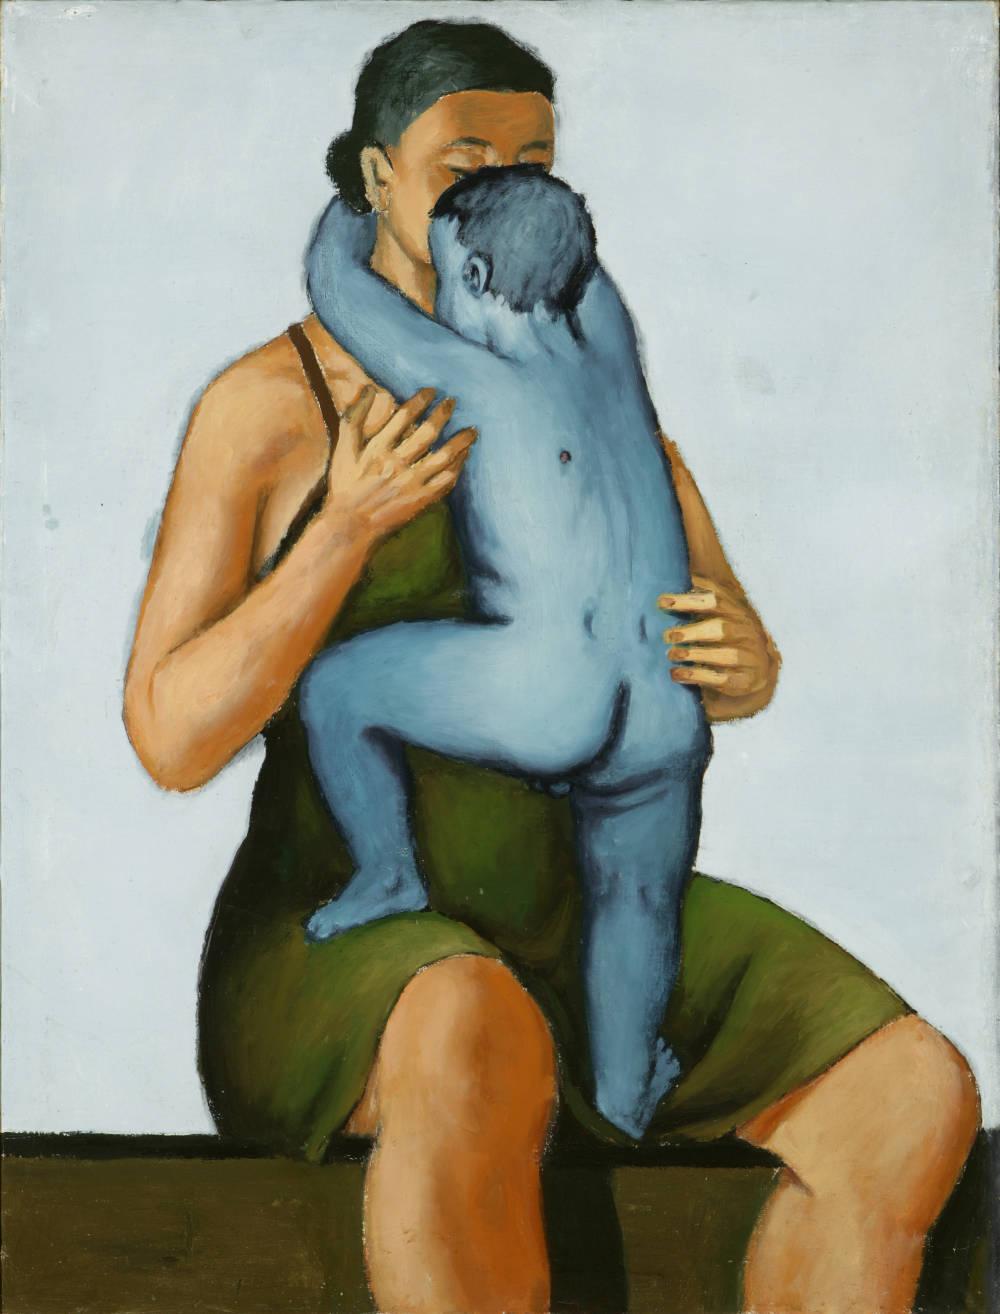 Andrzej Wróblewski, Mother with Dead Child, 1949. Oil on canvas 120 x 90 cm. Collection of Grazyna Kulczyk ©Andrzej Wróblewski Foundation